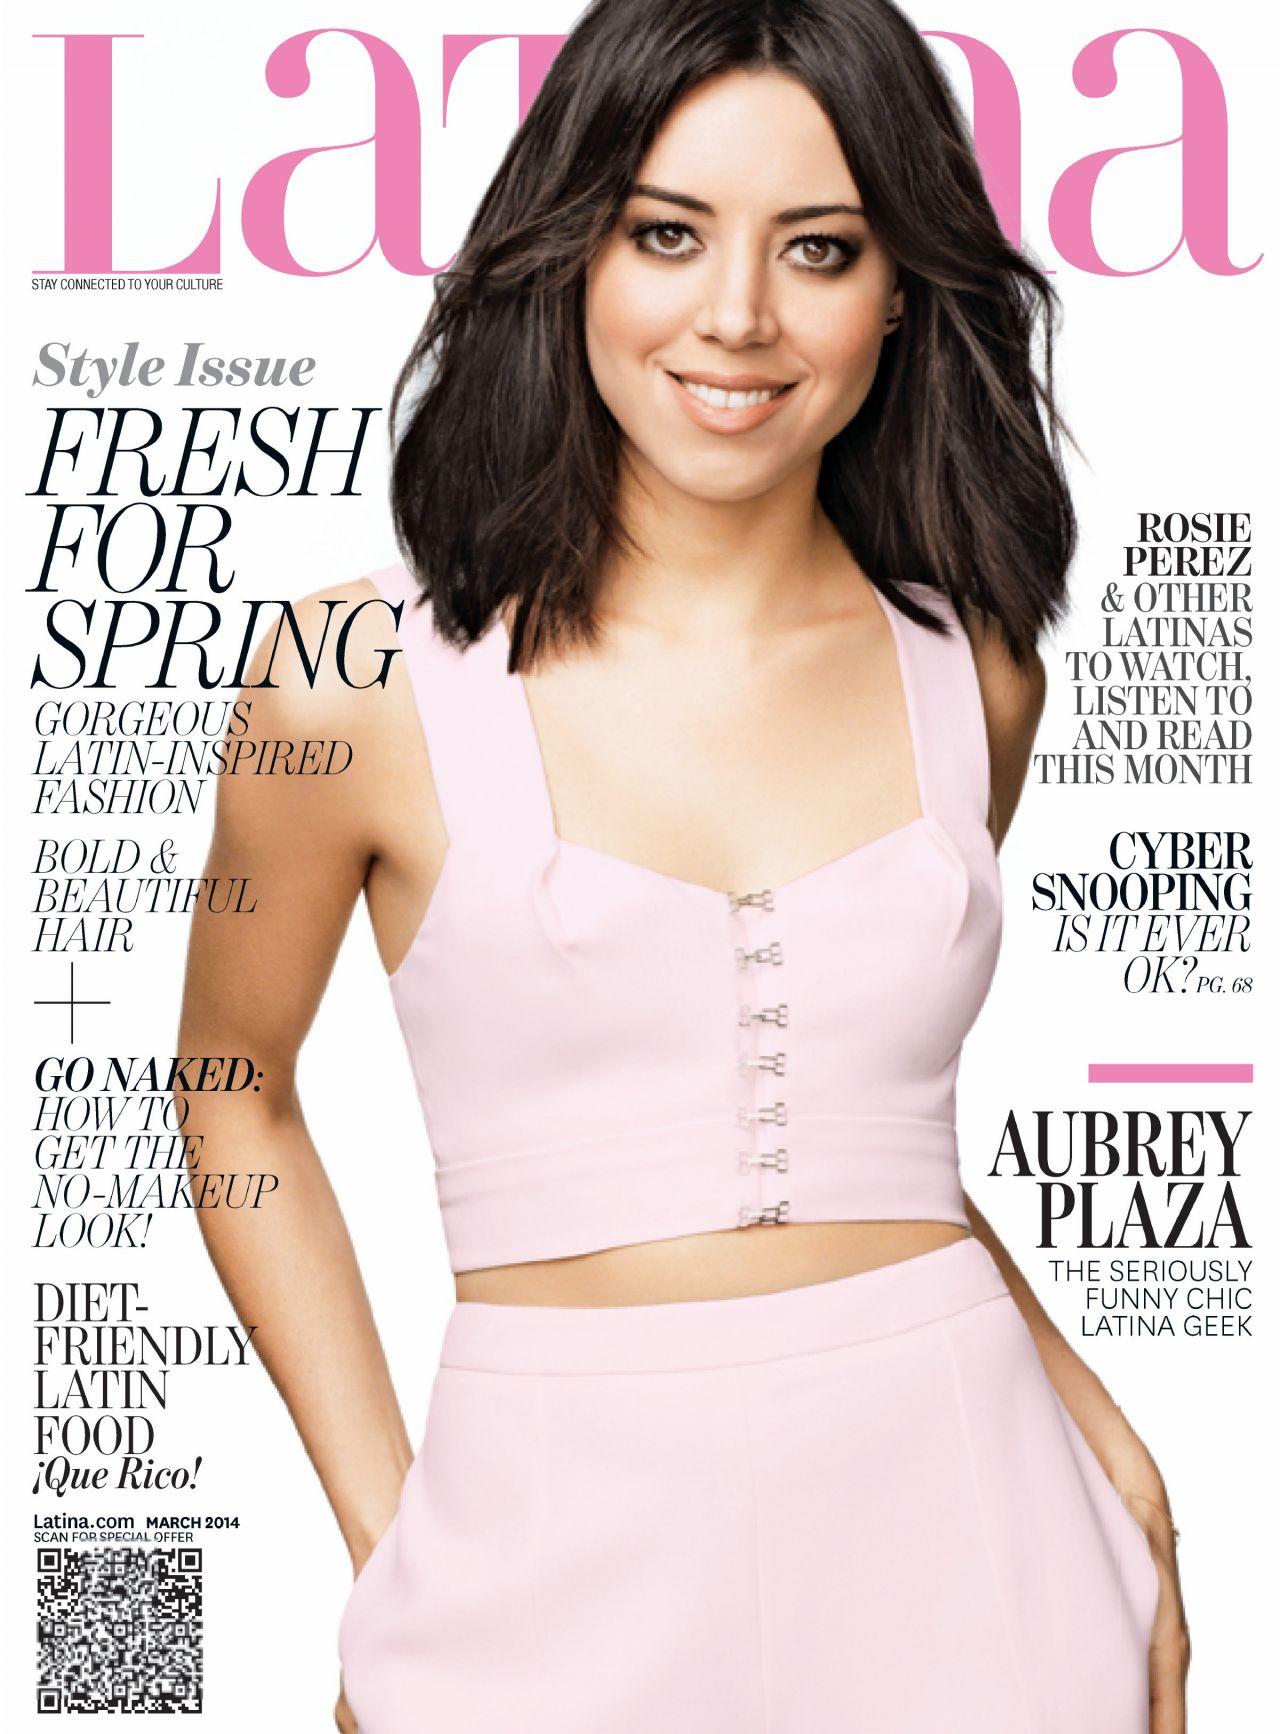 Aubrey Plaza - LATINA Magazine - March 2014 Issue